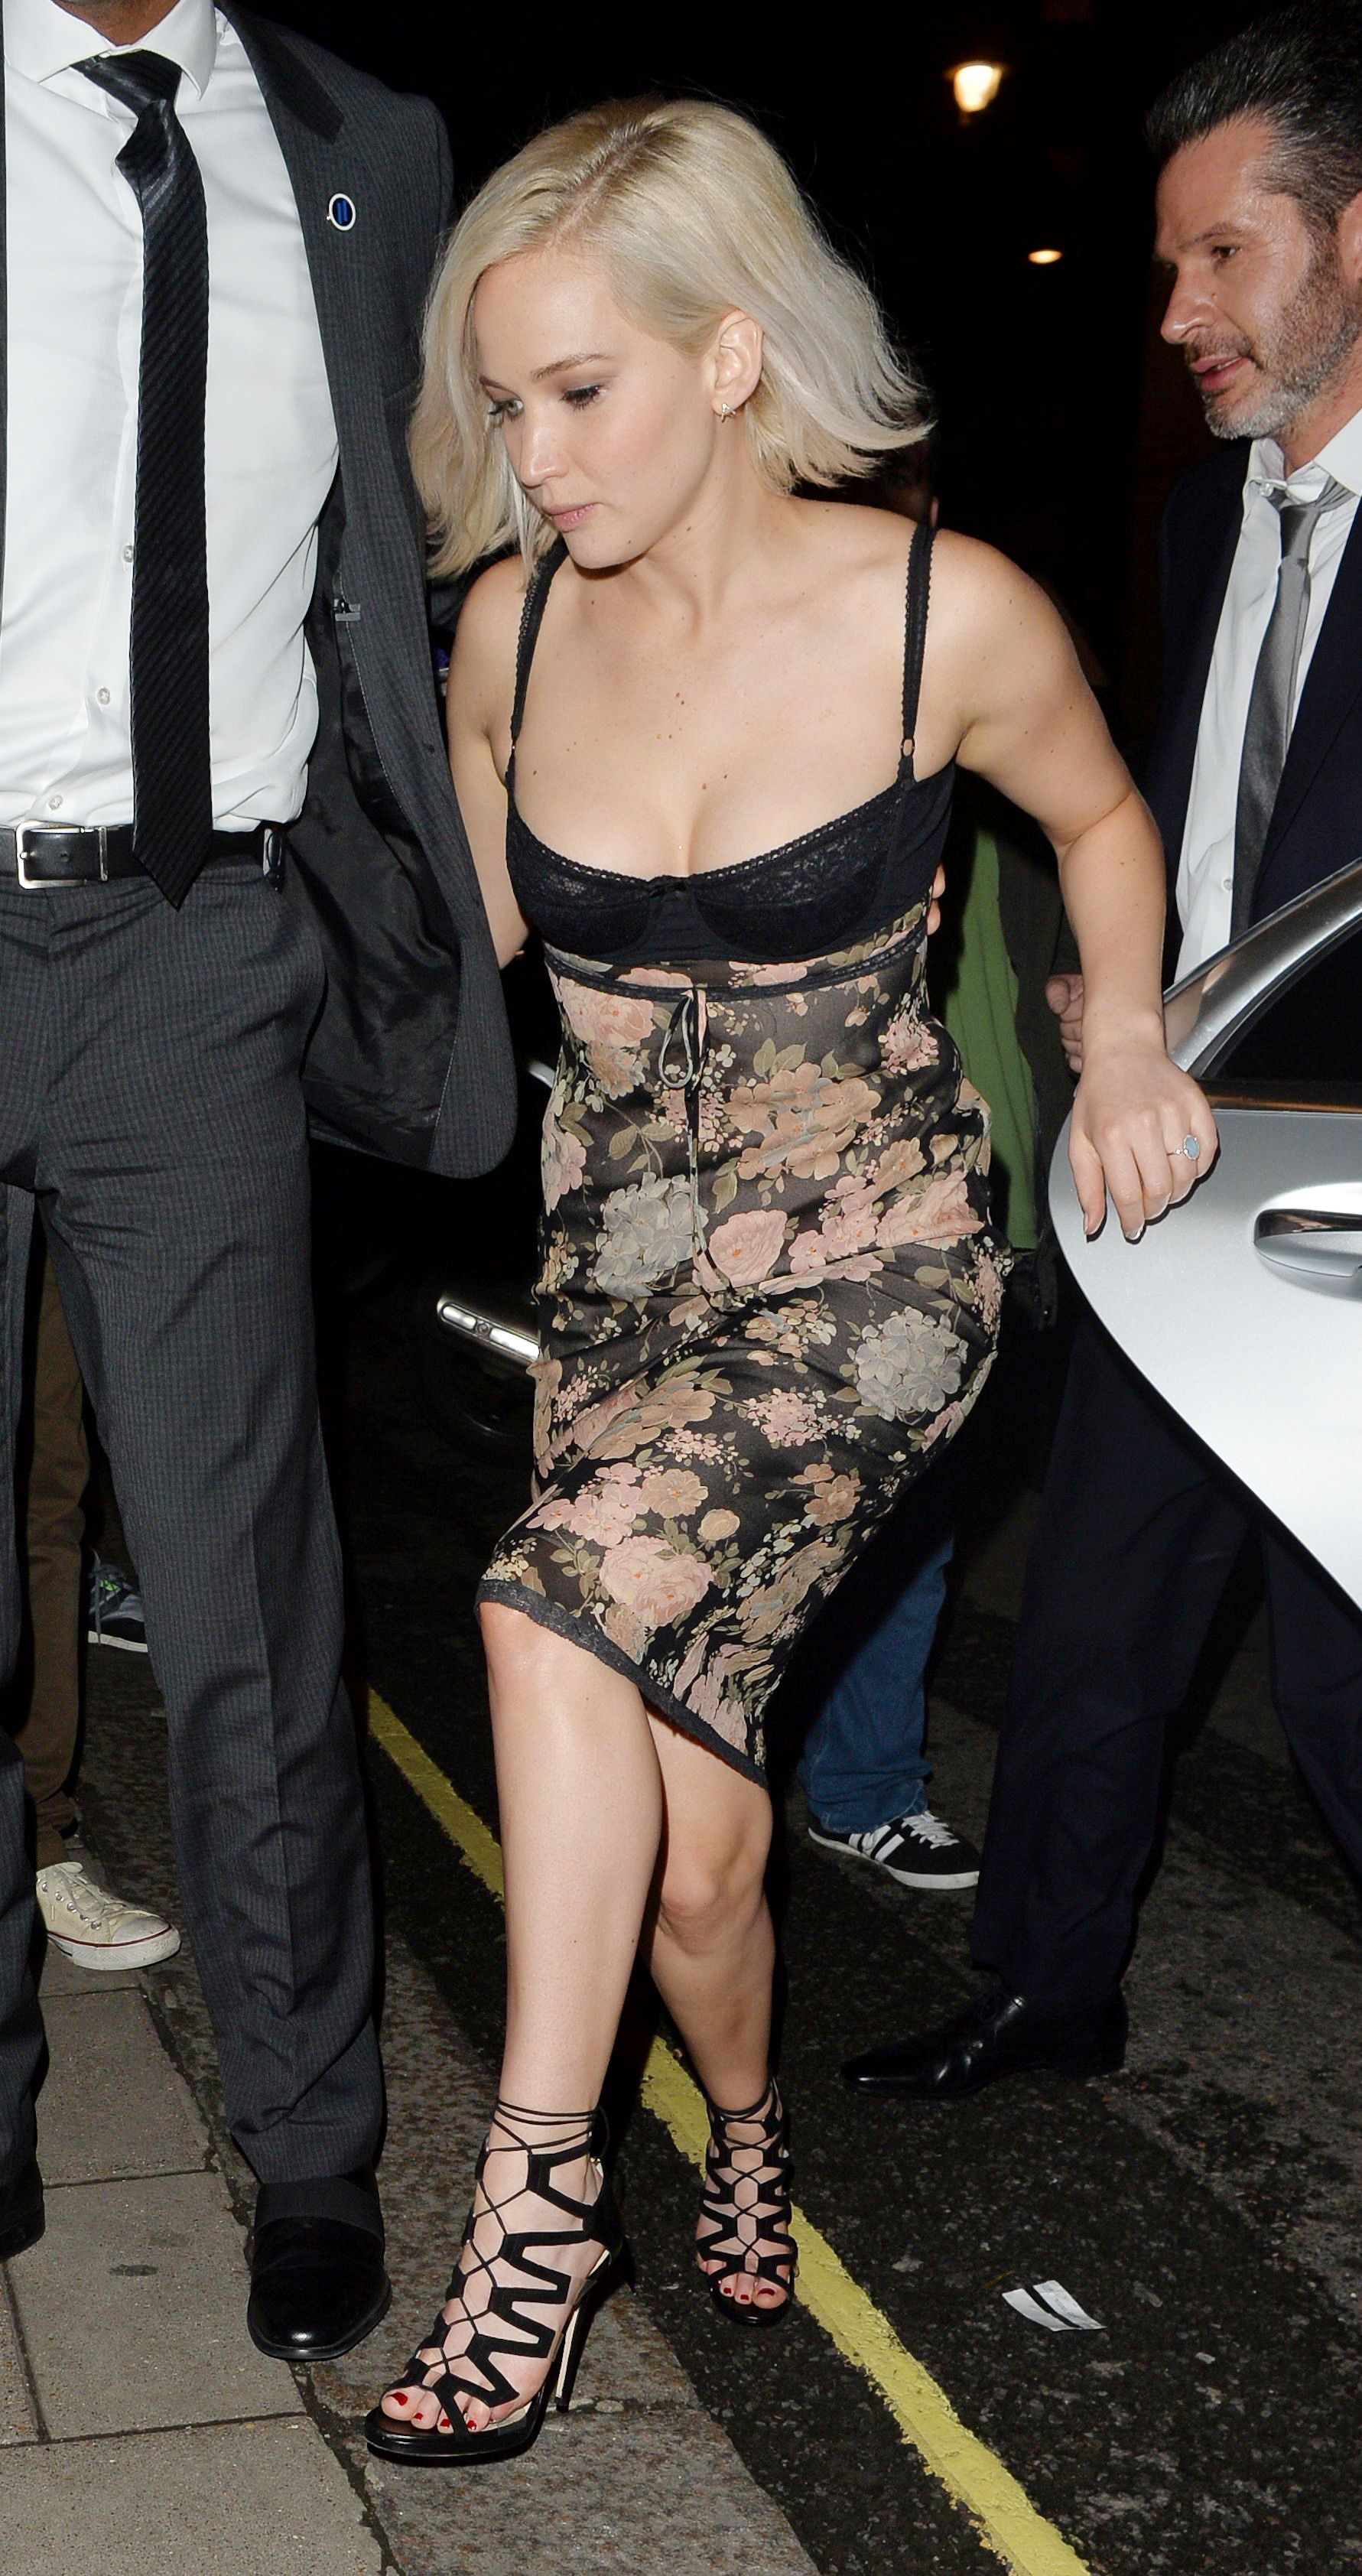 Jennifer-Lawrence-Sexy-3 (1)